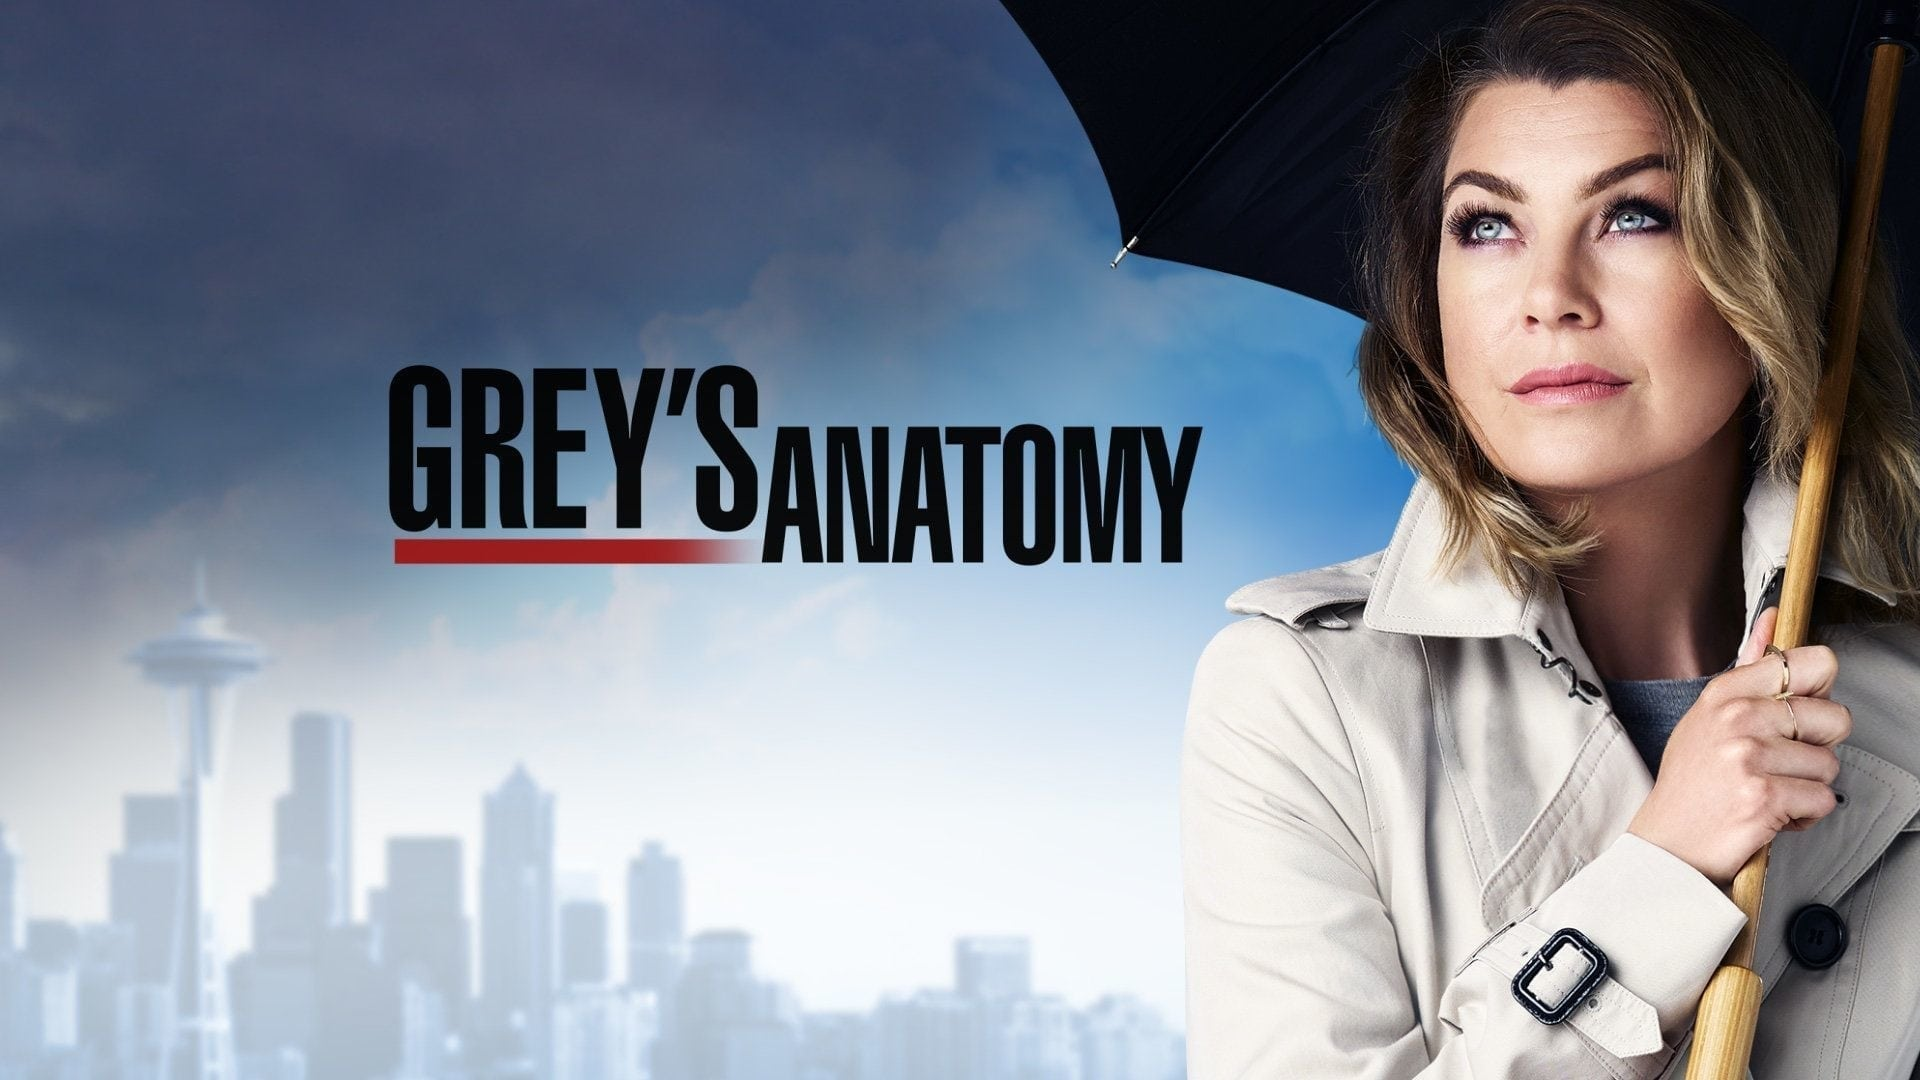 Grey's Anatomy - Season 10